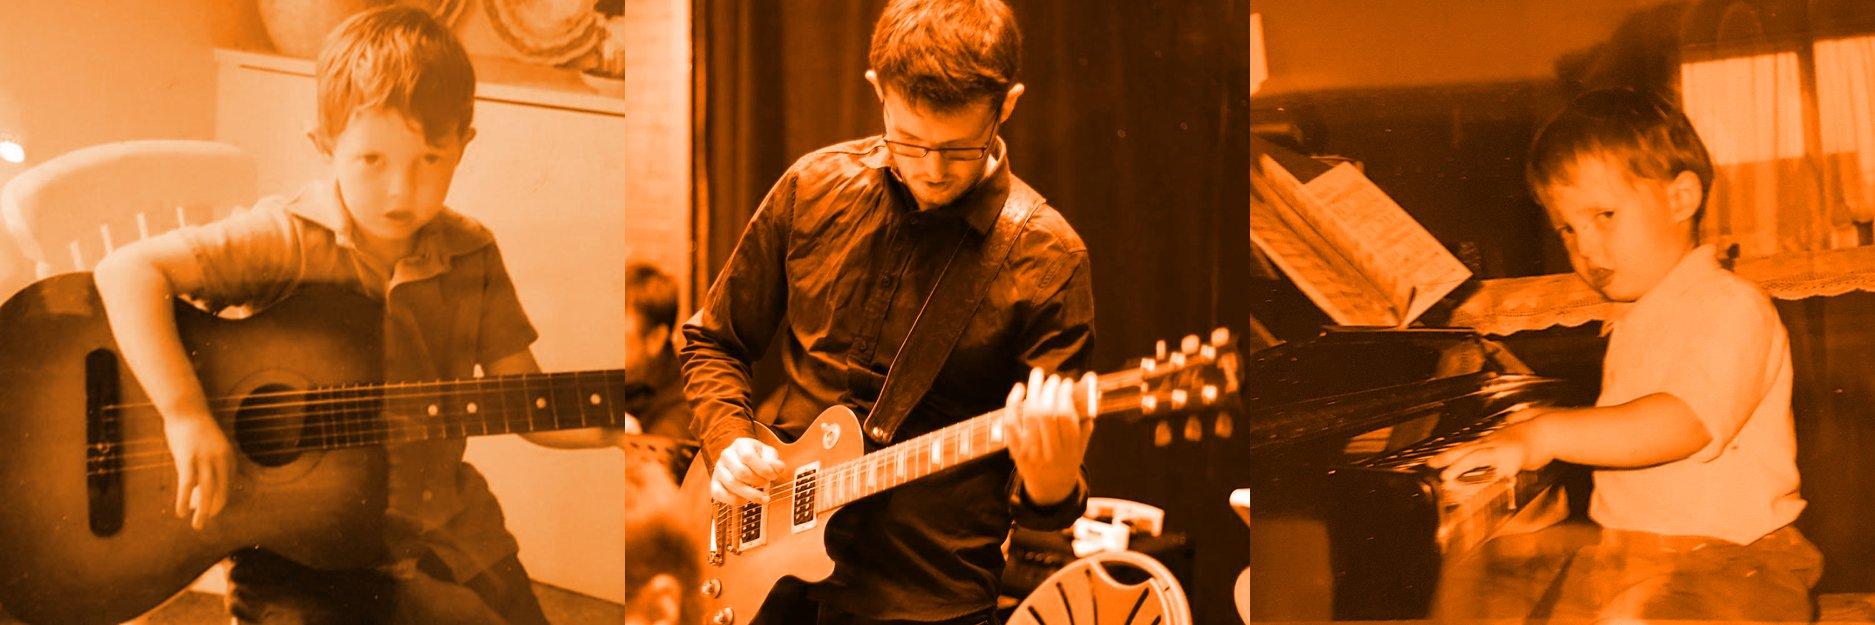 About Milton Keynes Guitar Tuition